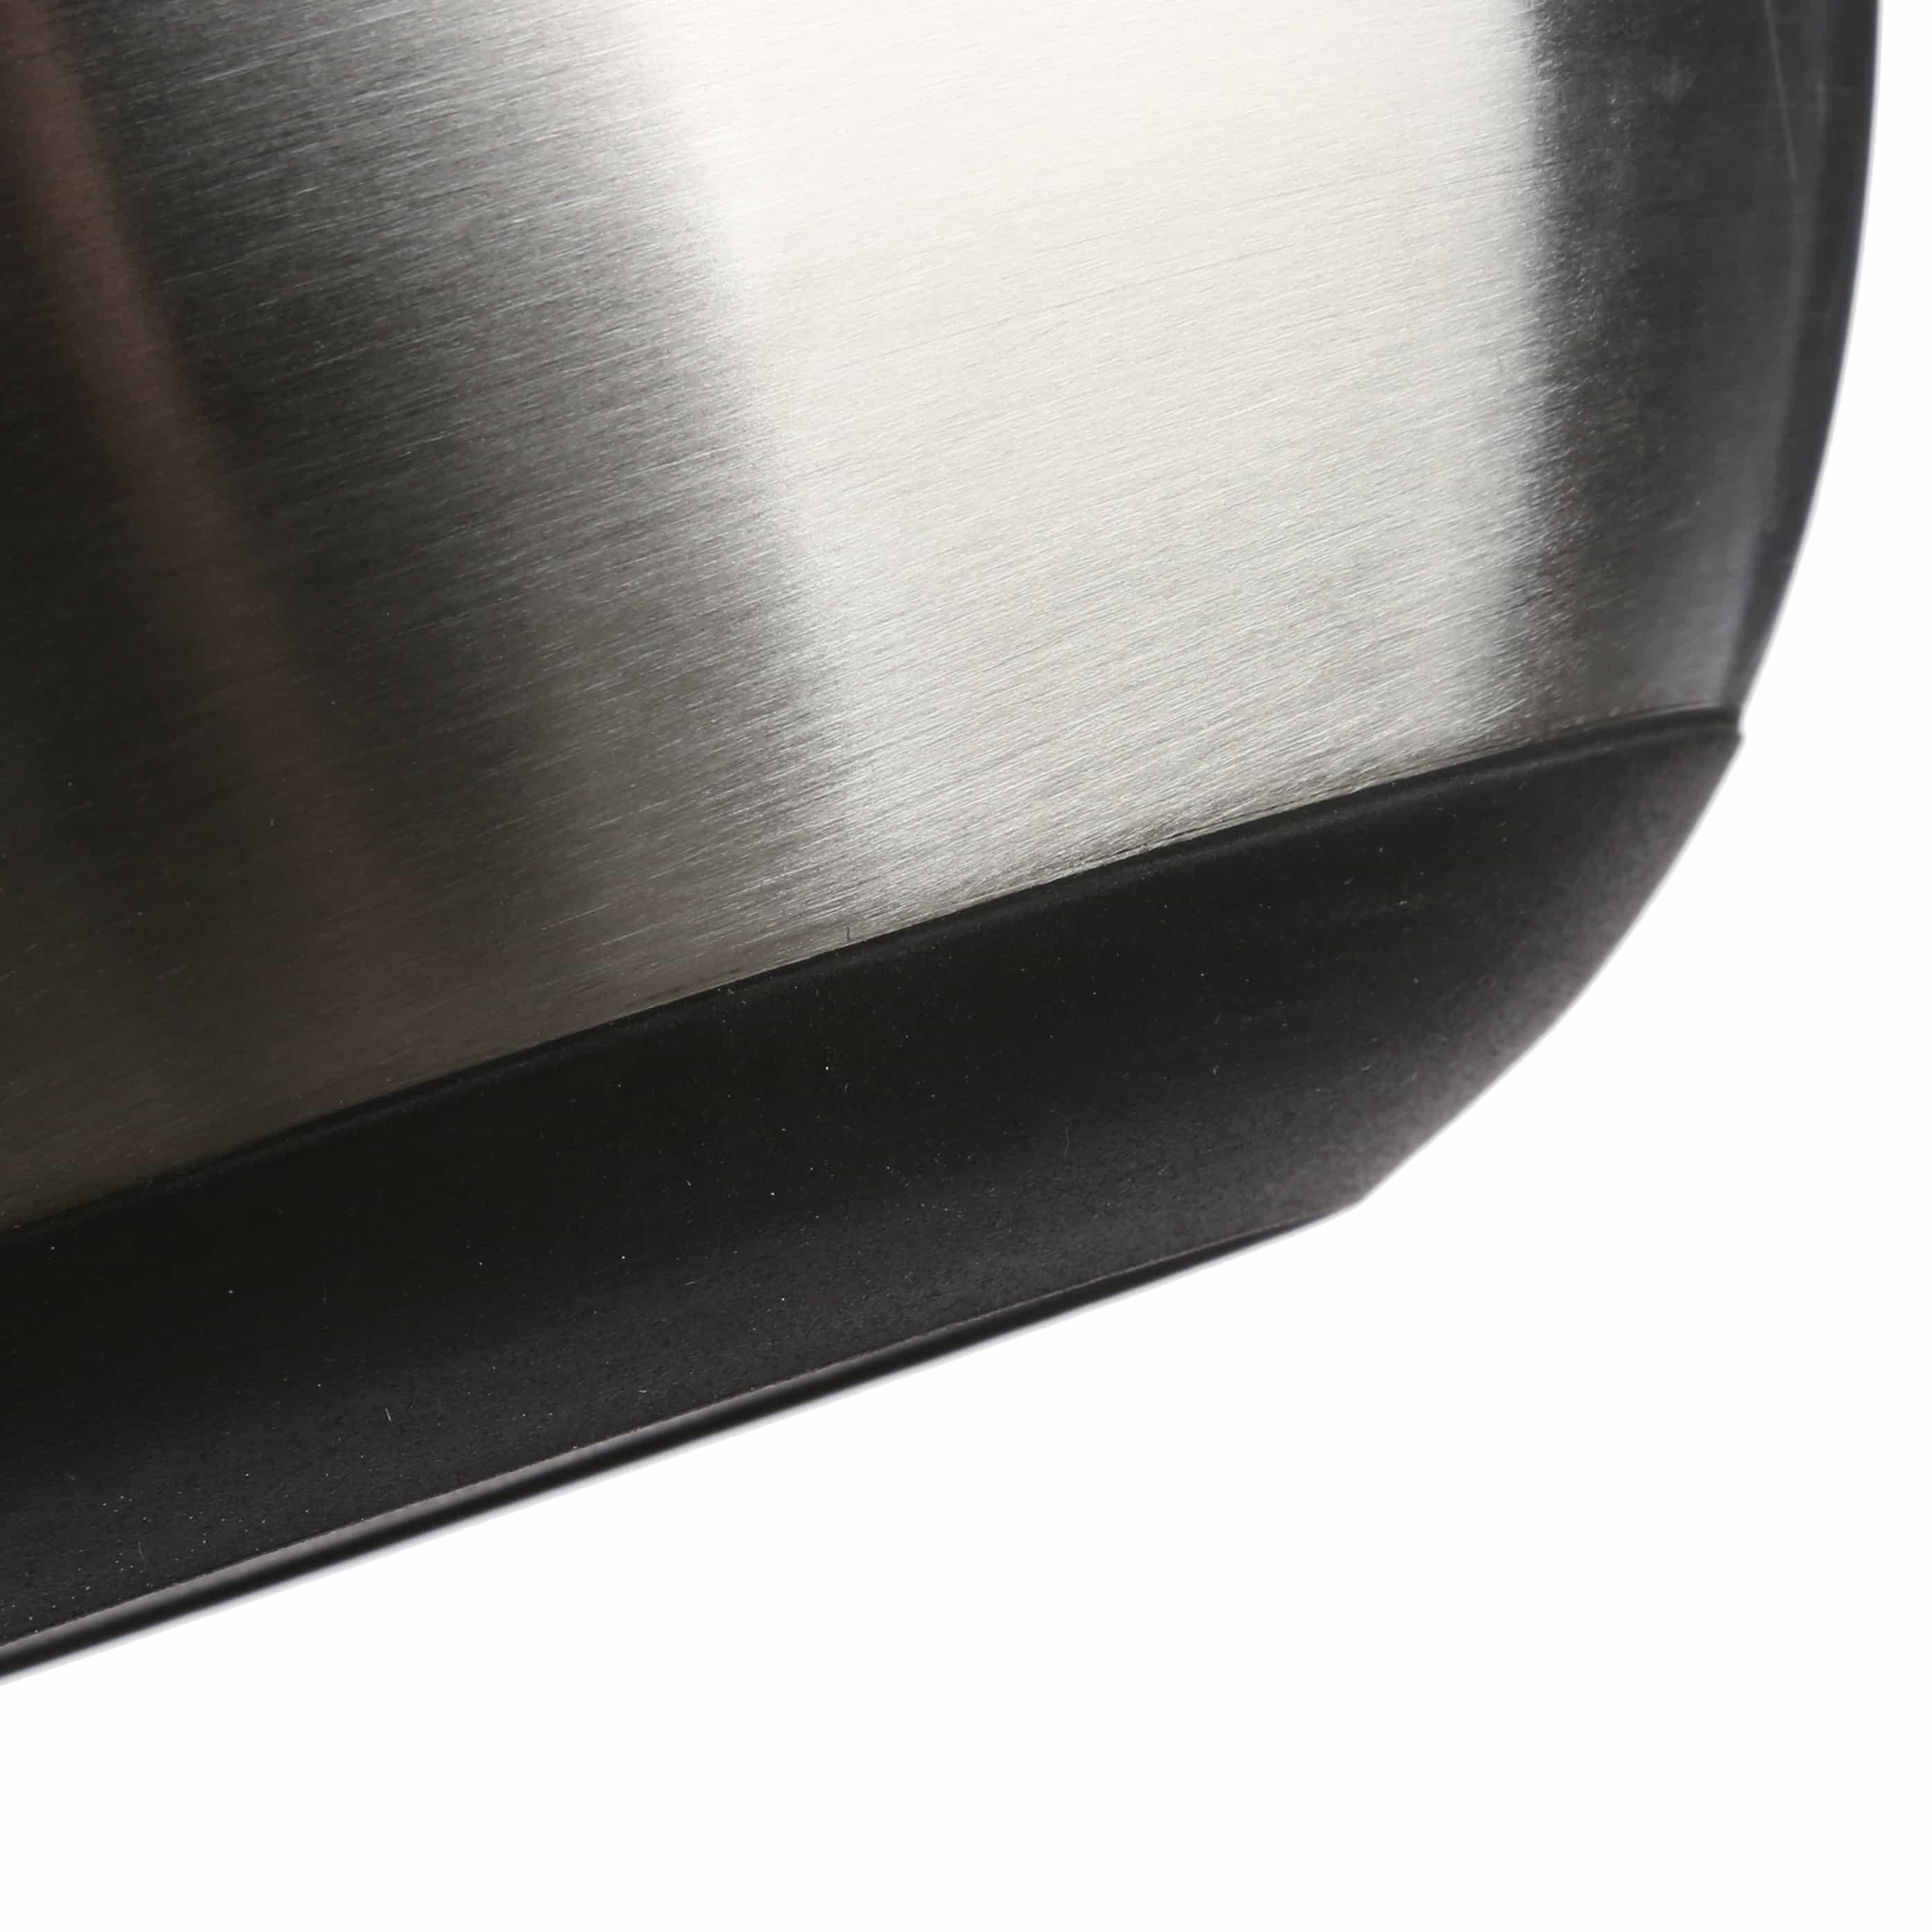 4goodz Mengkom RVS XL met Antislip bodem 4,5 liter